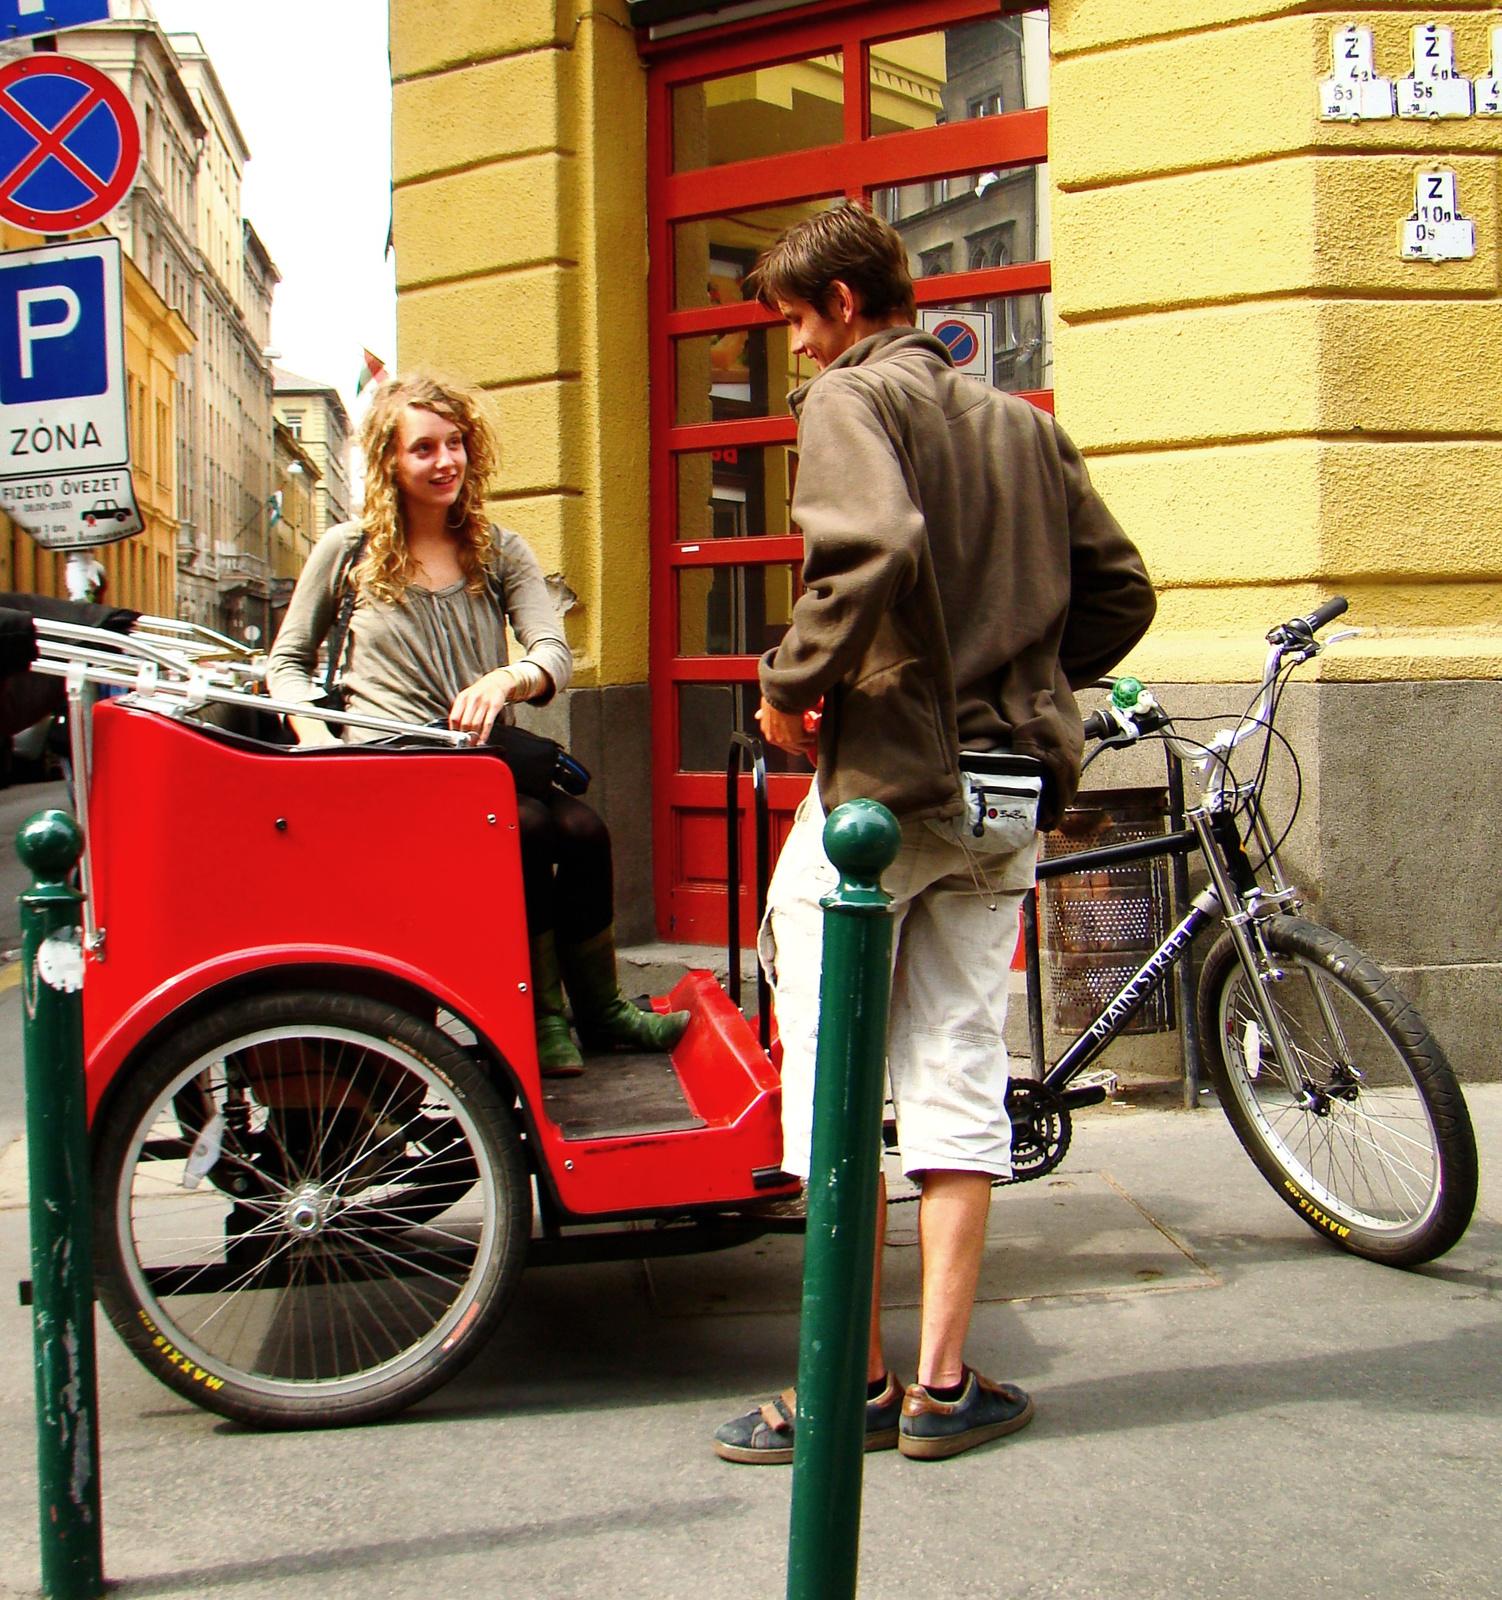 Triciklizünk?